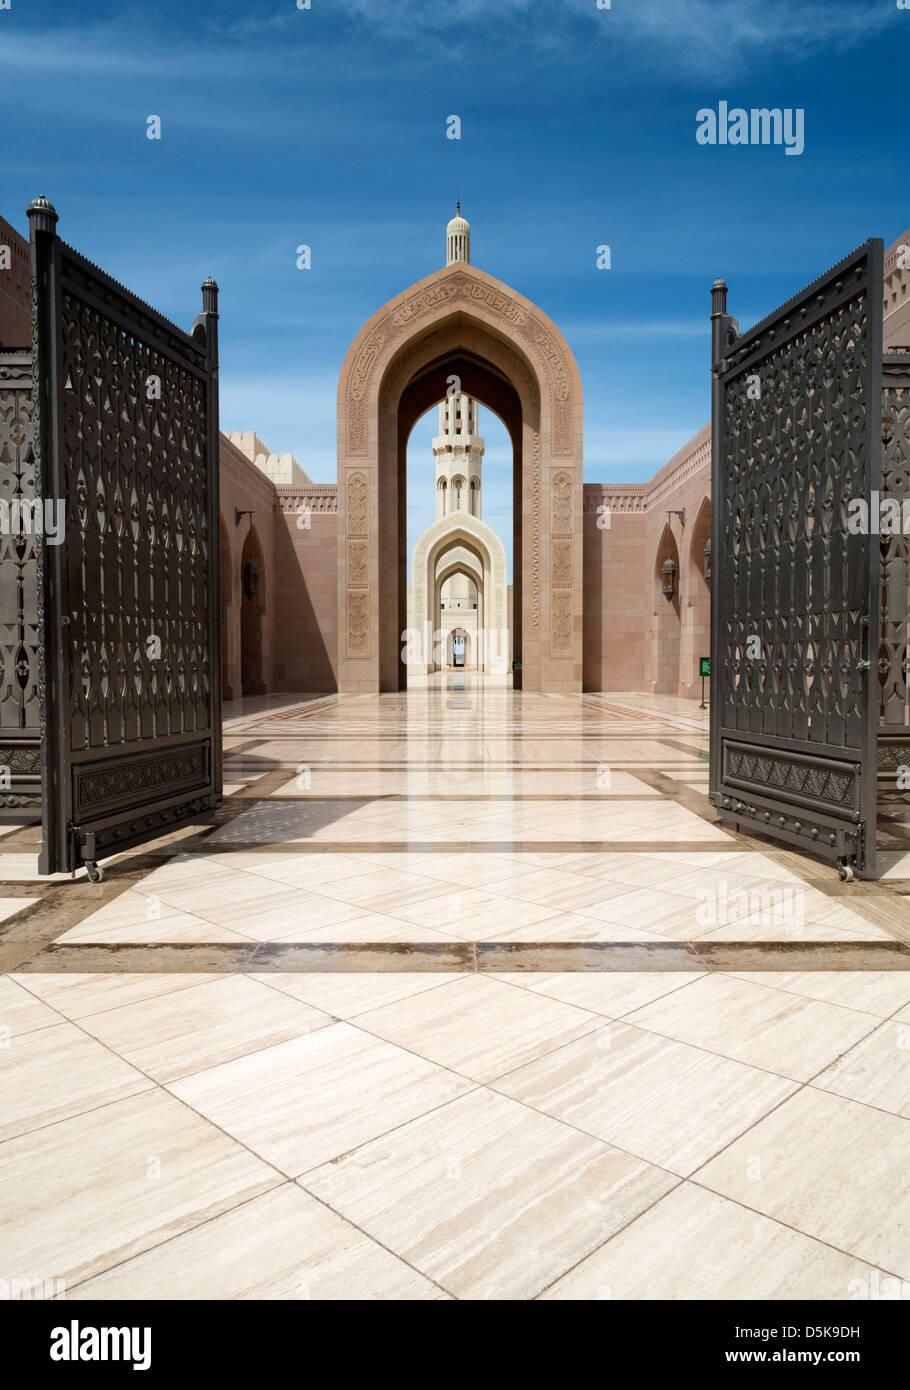 Le Sultan Qaboos Grand Mosque in Muscat Oman Moyen-orient Photo Stock